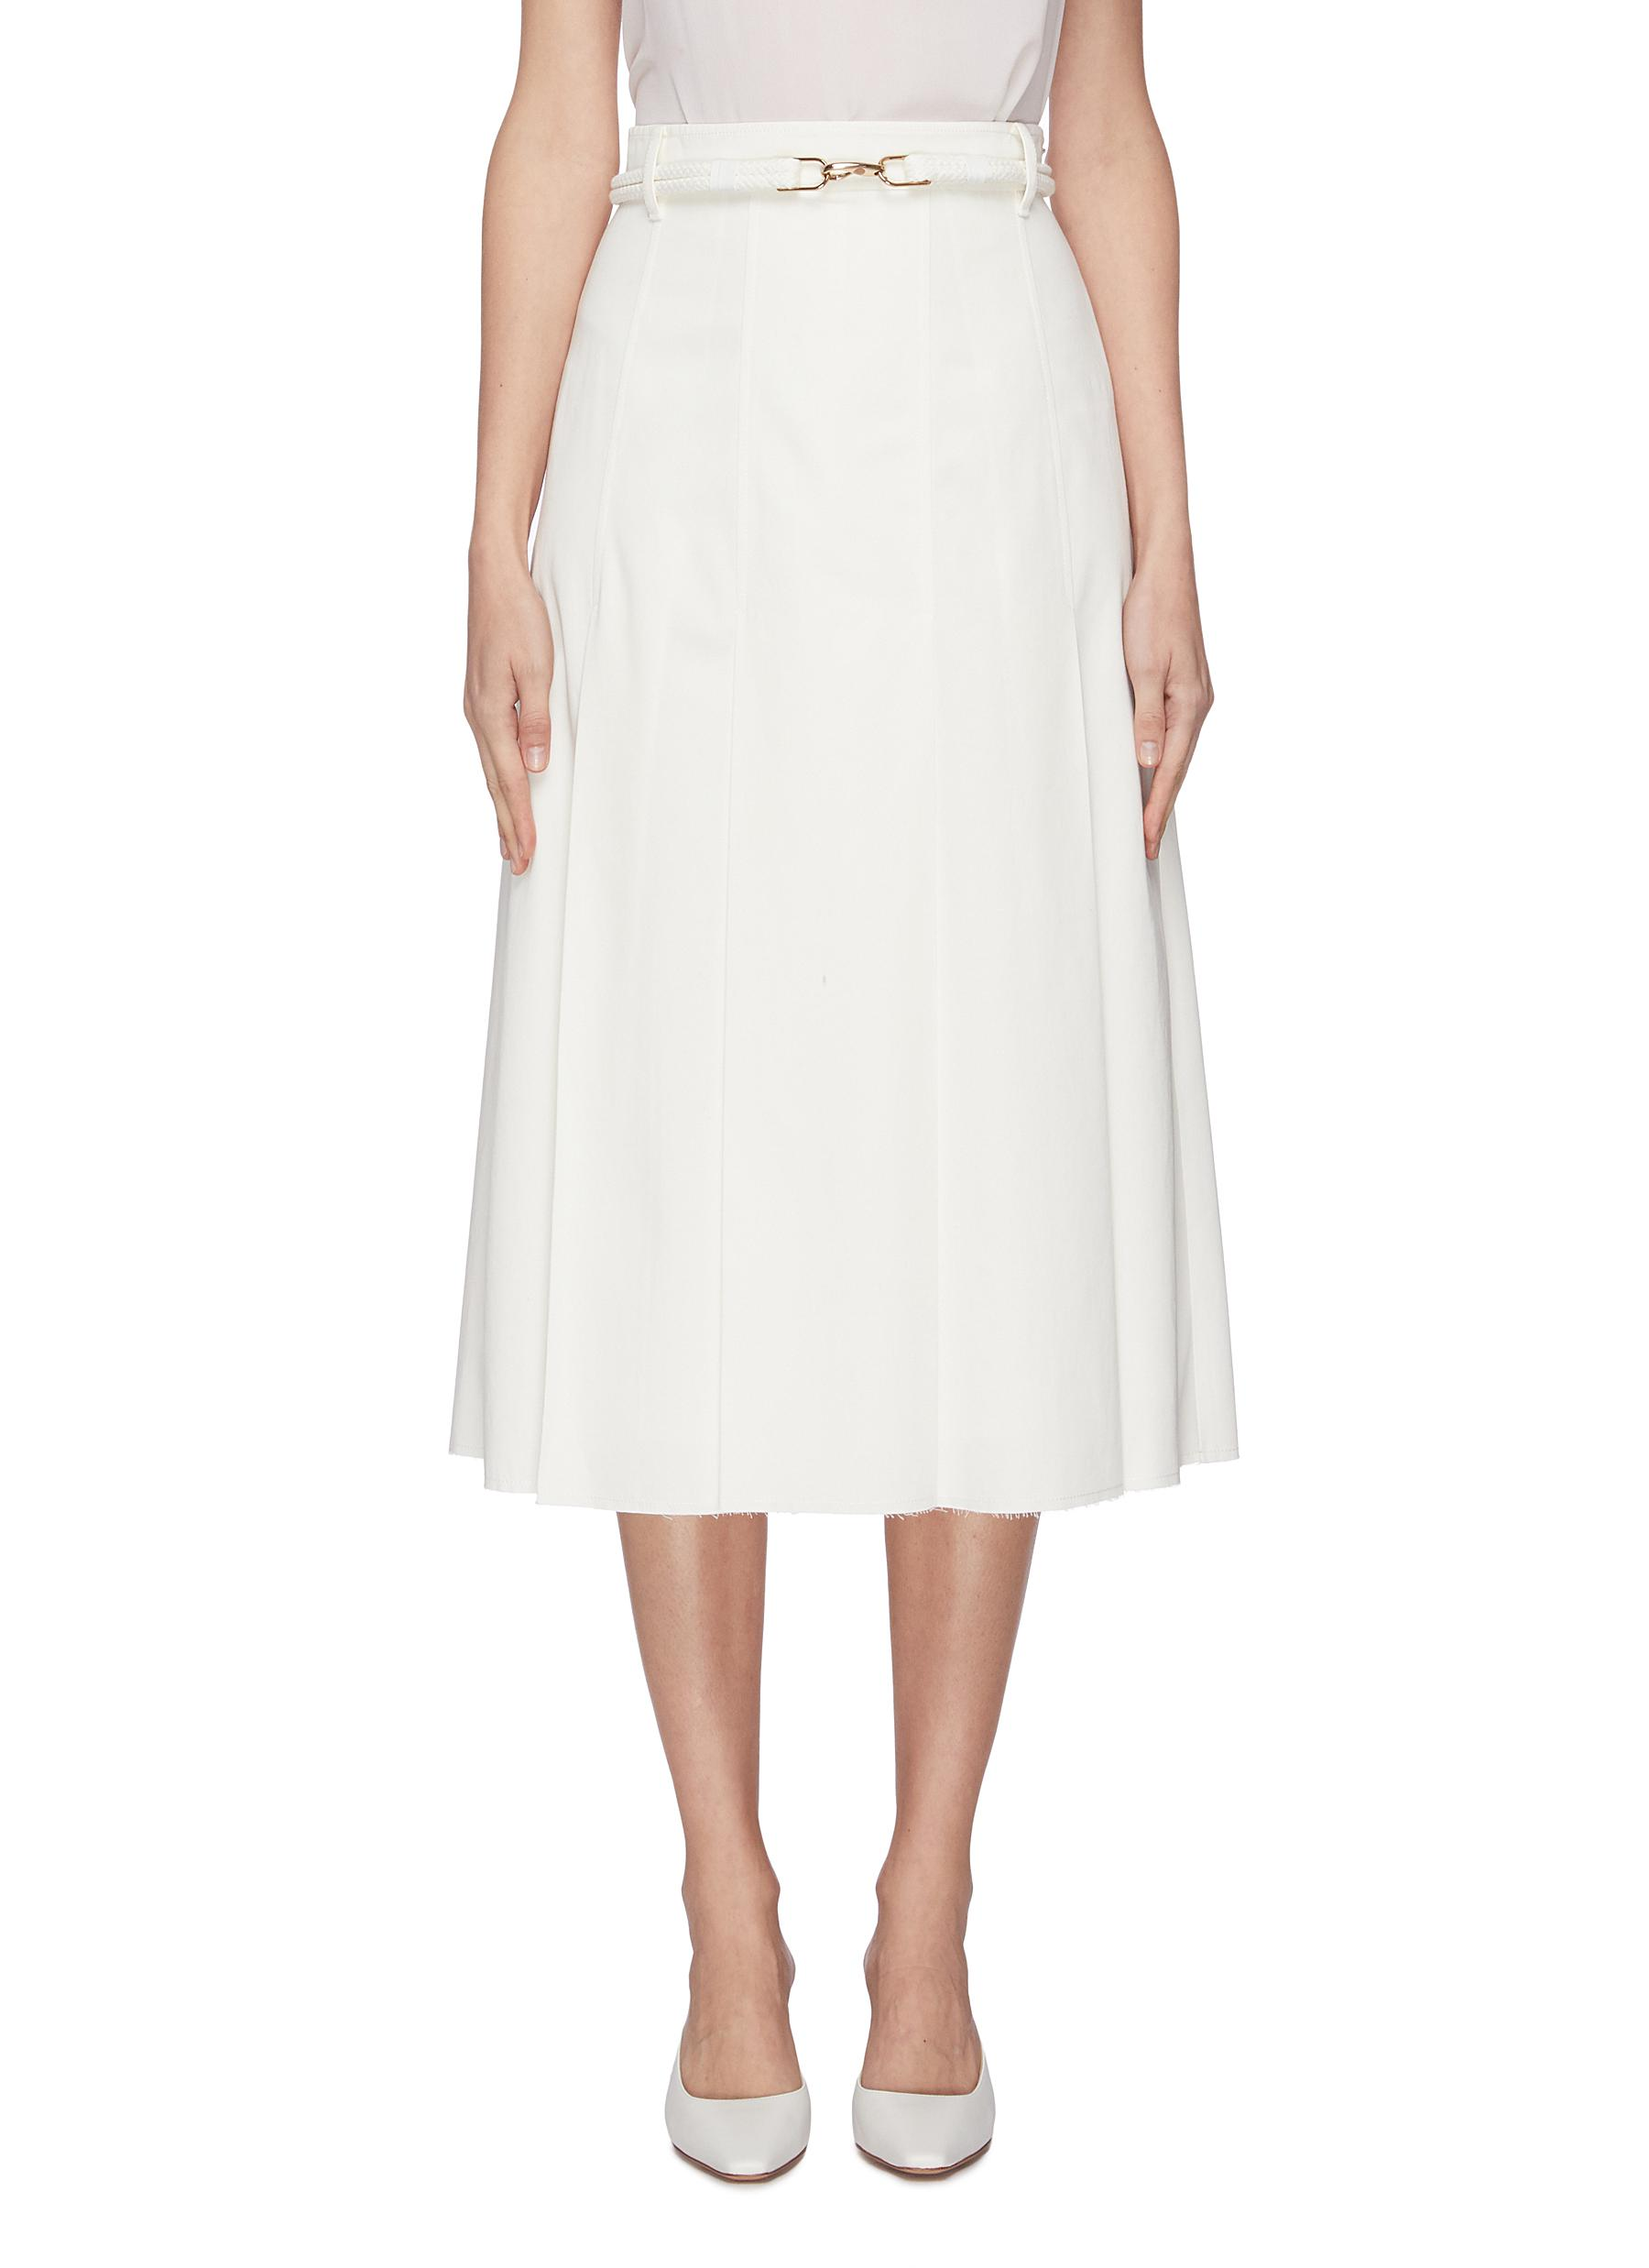 Buy Gabriela Hearst Skirts 'Herbert' rope belted pleated skirt